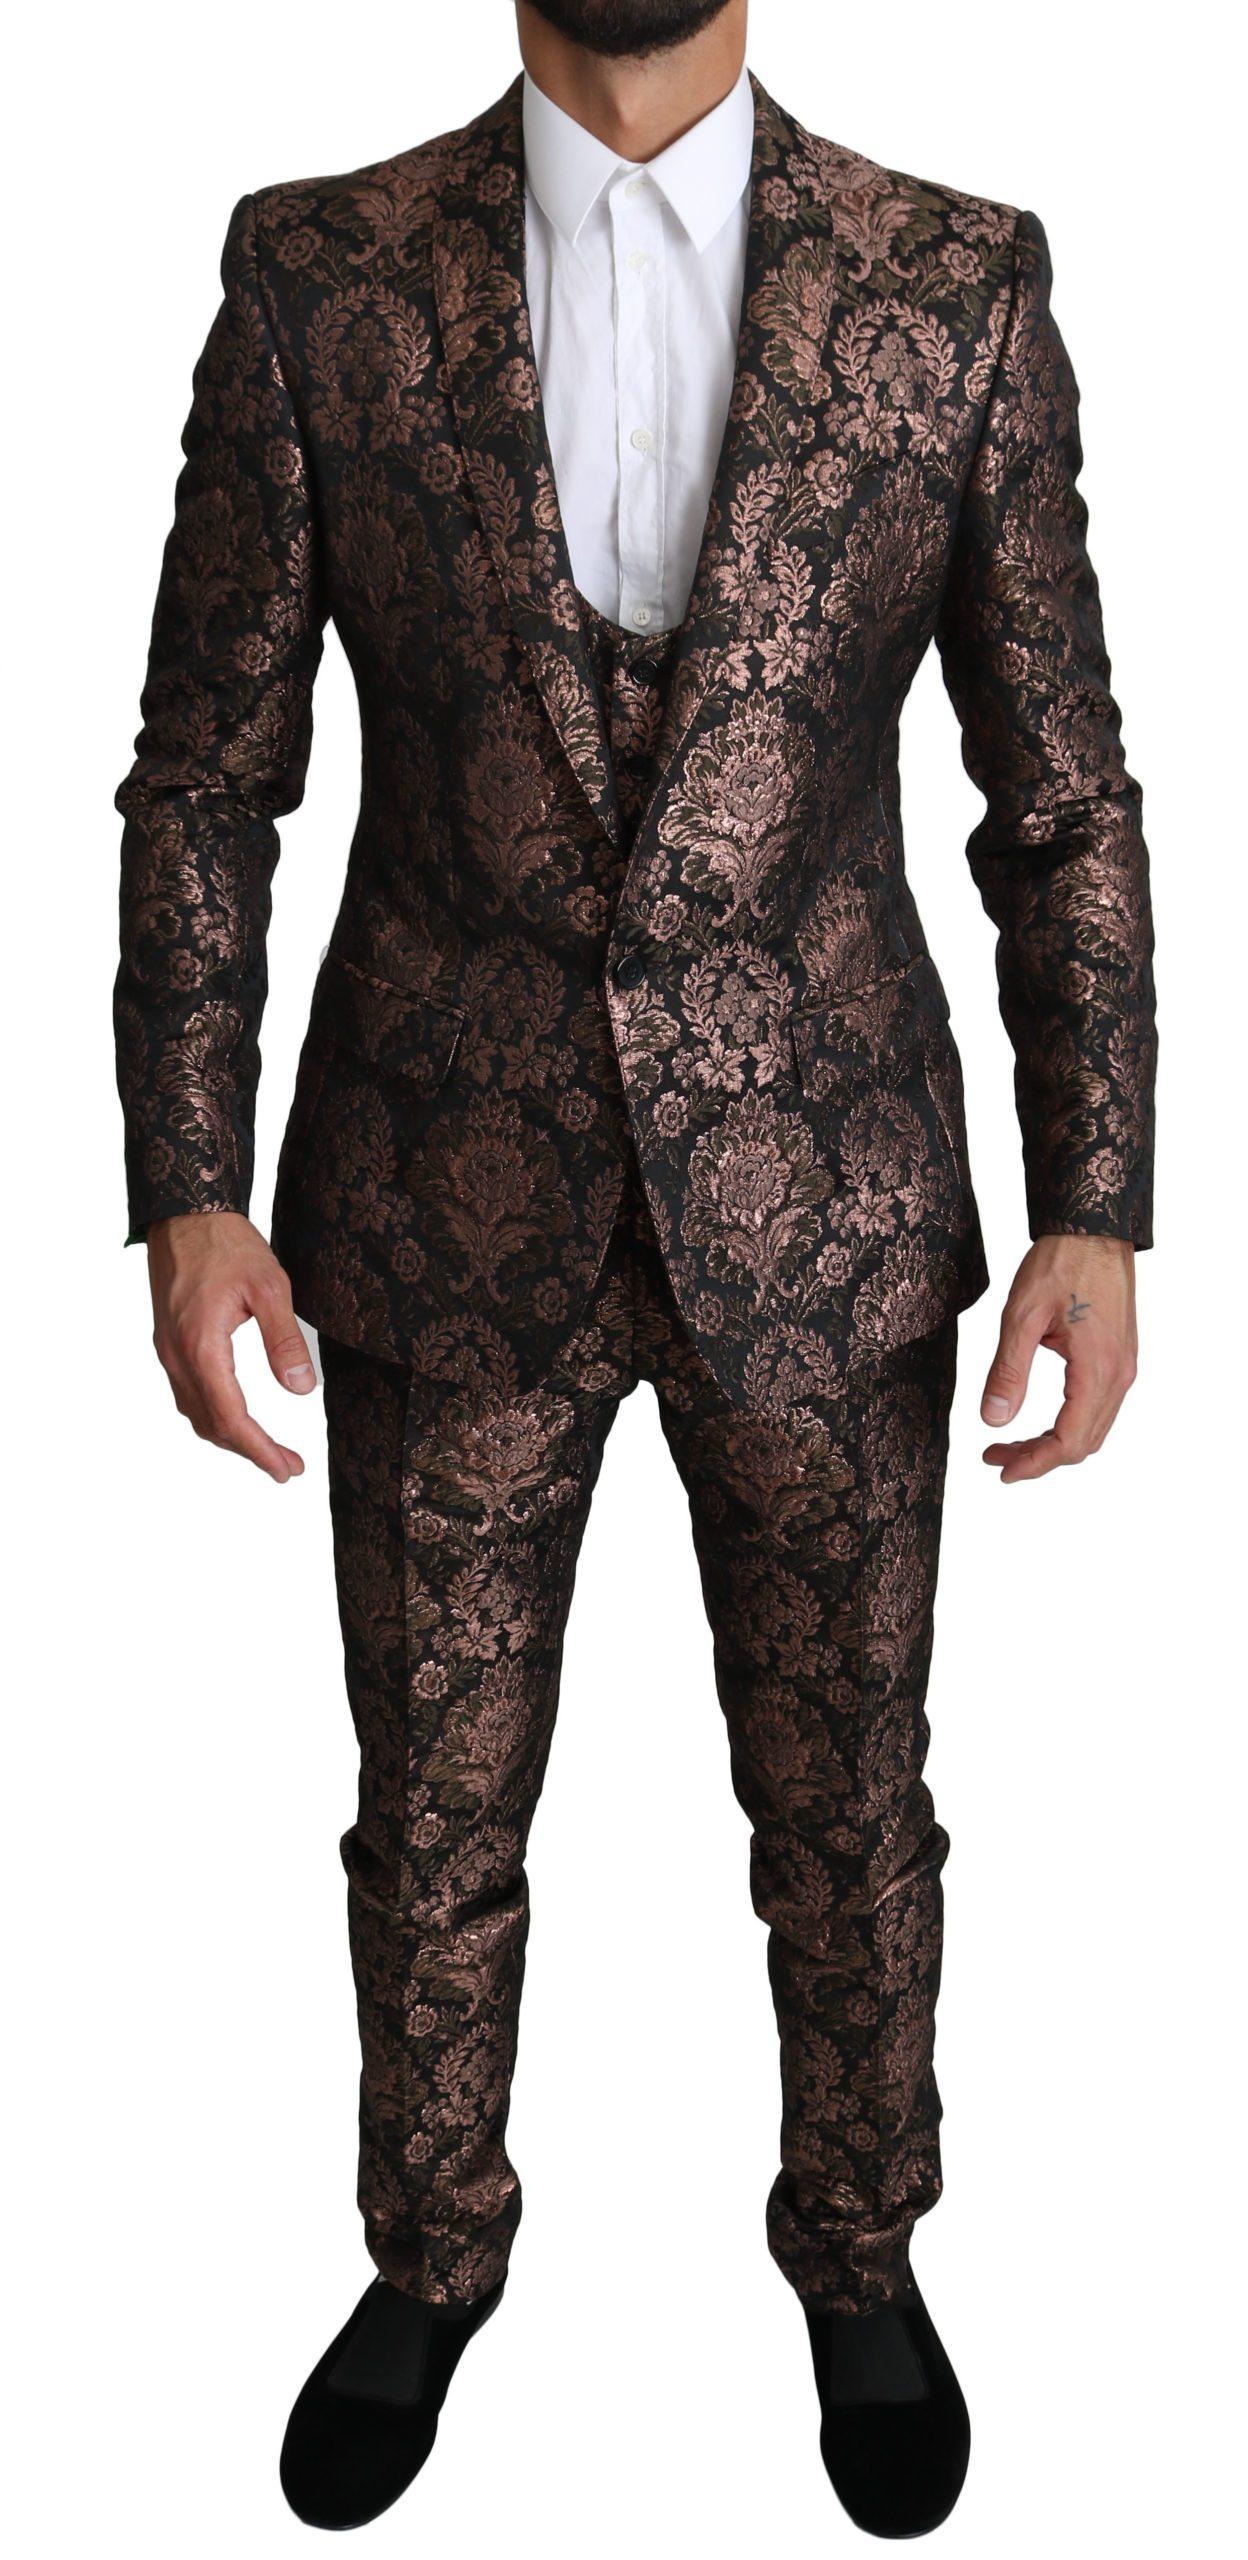 Dolce & Gabbana Men's Floral Brocade 3 Piece MARTINI Suit Rose Gold KOS1527 - IT48   M